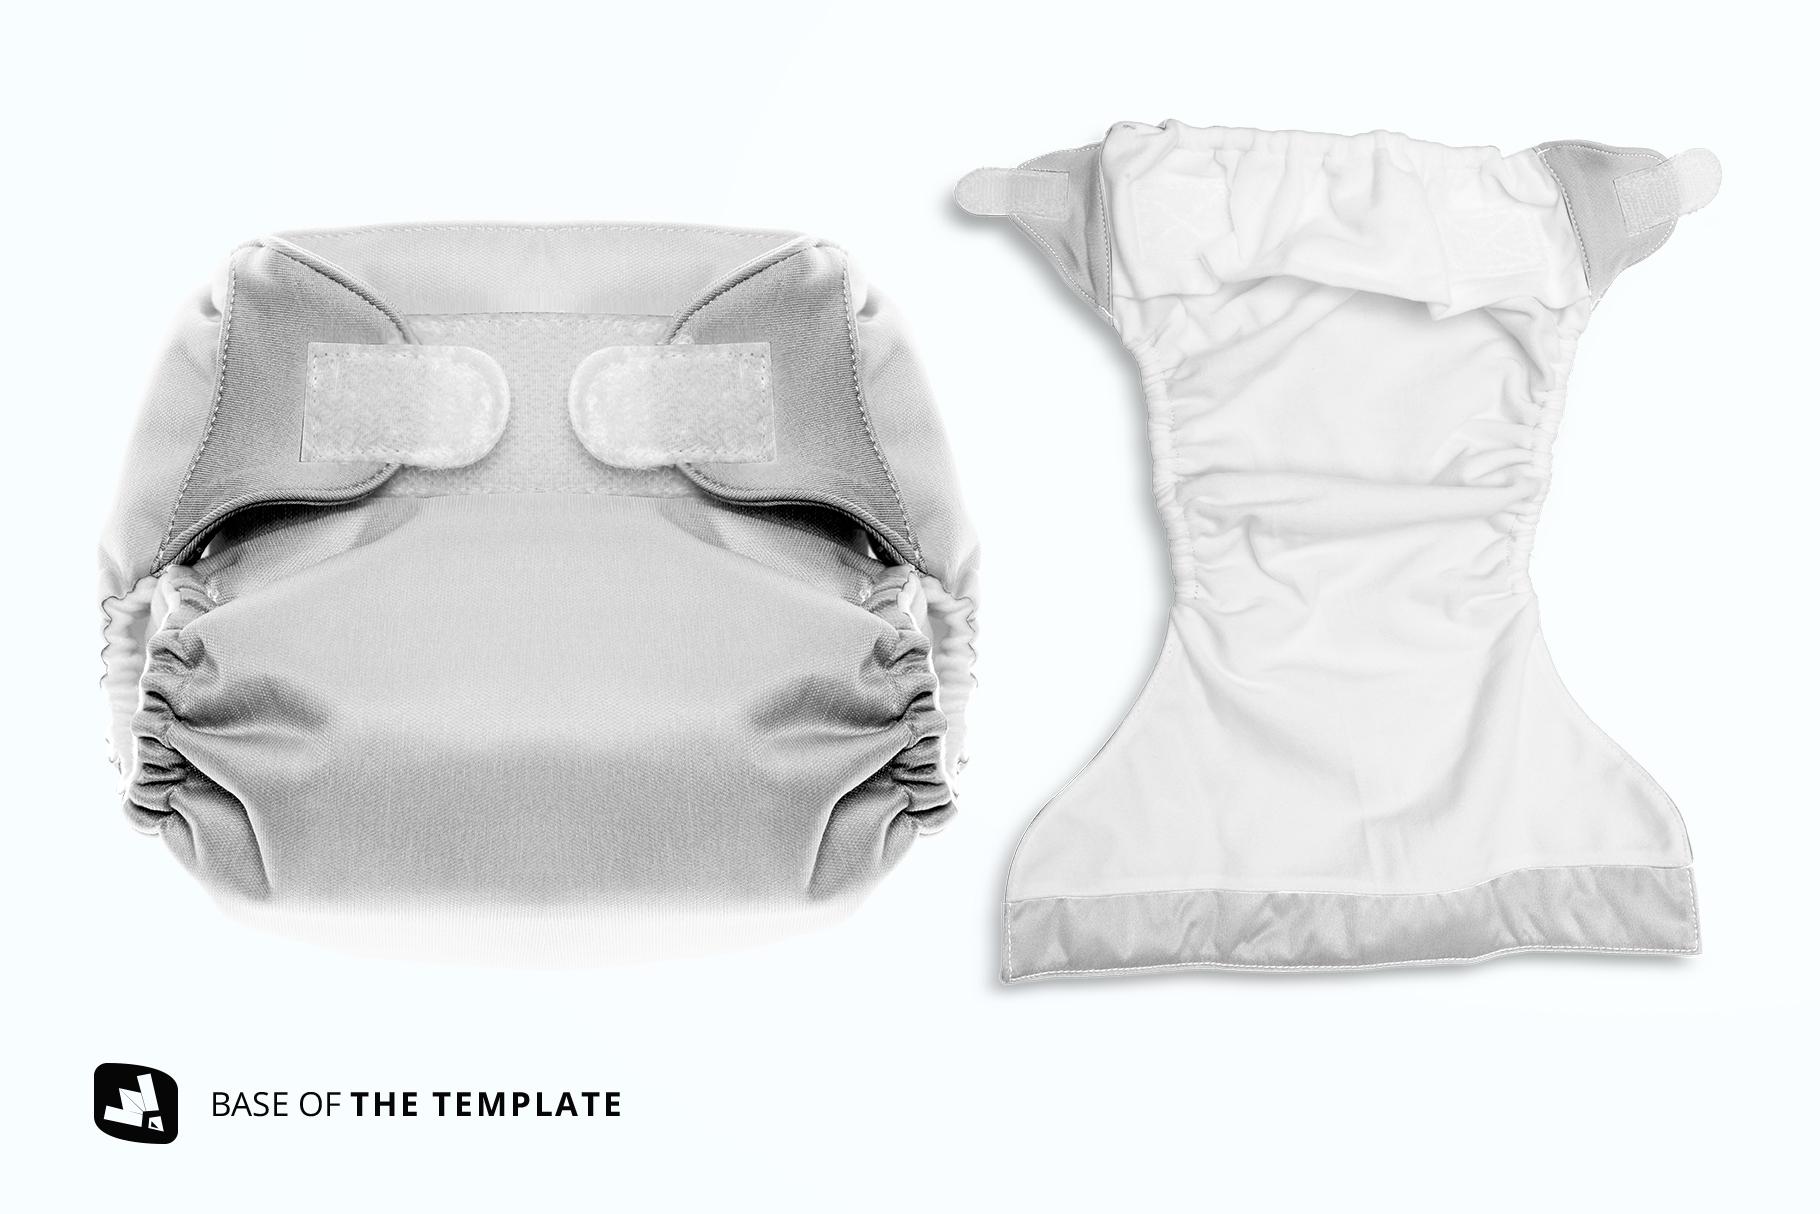 base image of the reusable velcro cloth diaper mockup